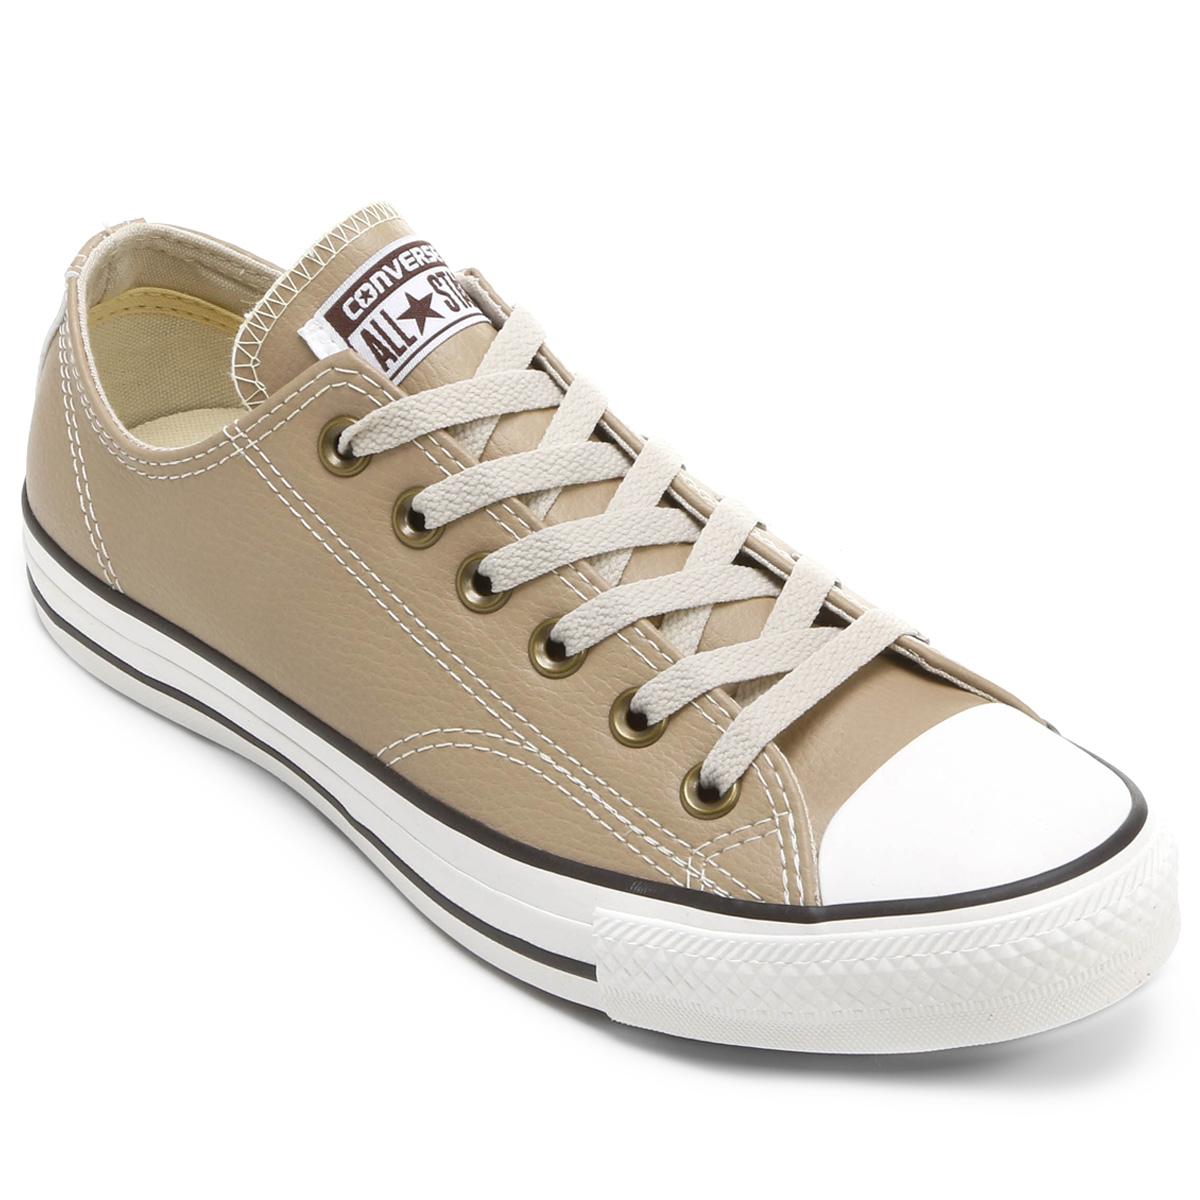 8f722a40f tenis converse - Netshoes - Tênis Converse All Star - R  139